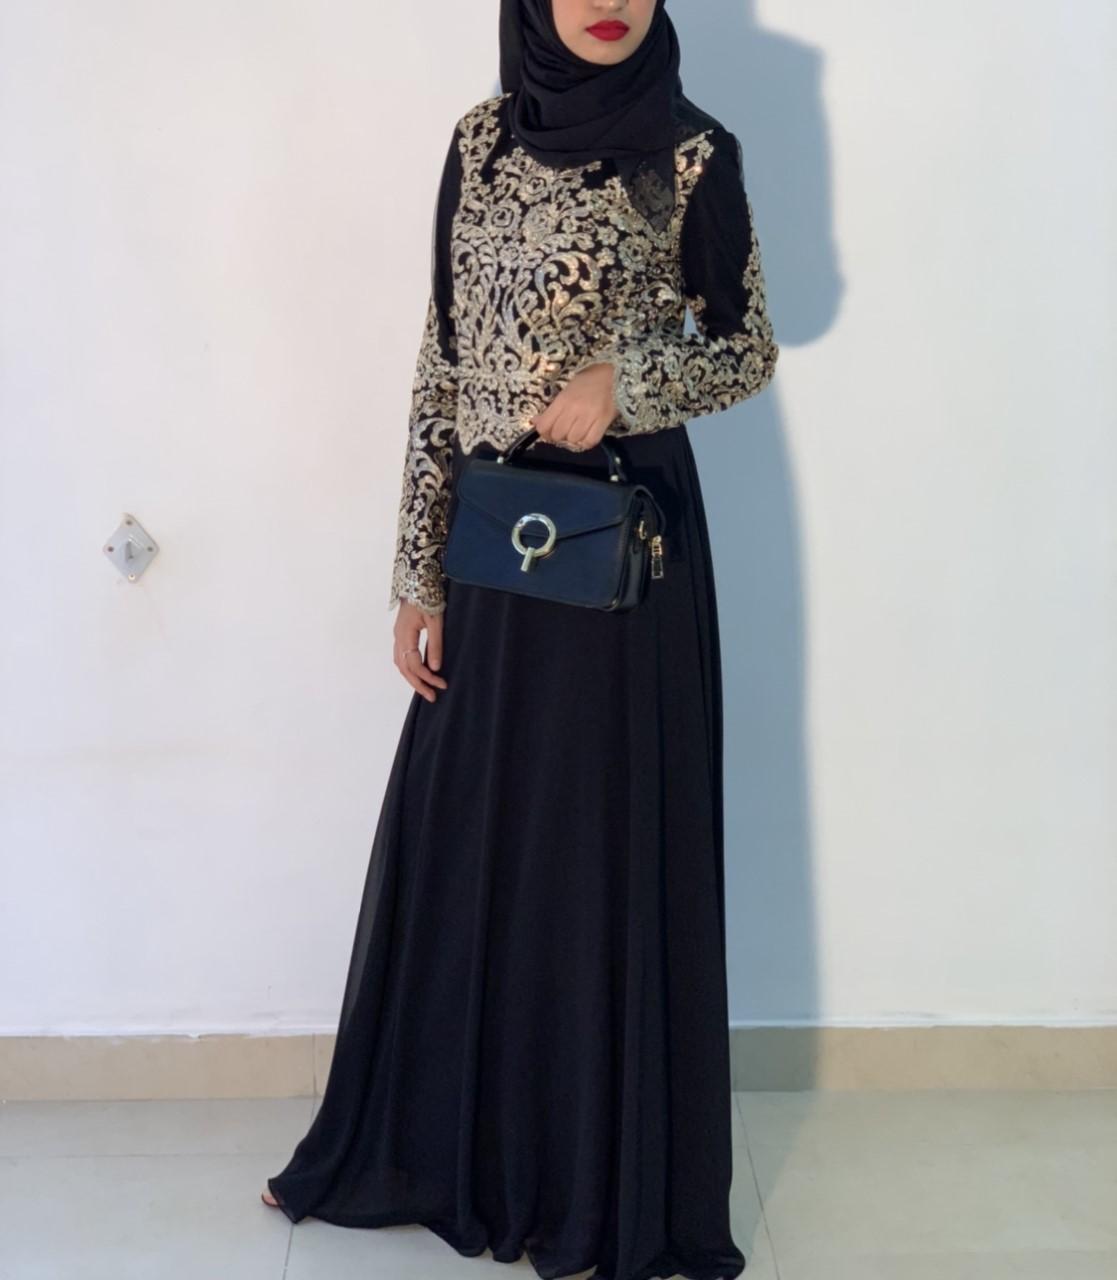 Fashionable Turkish dresses